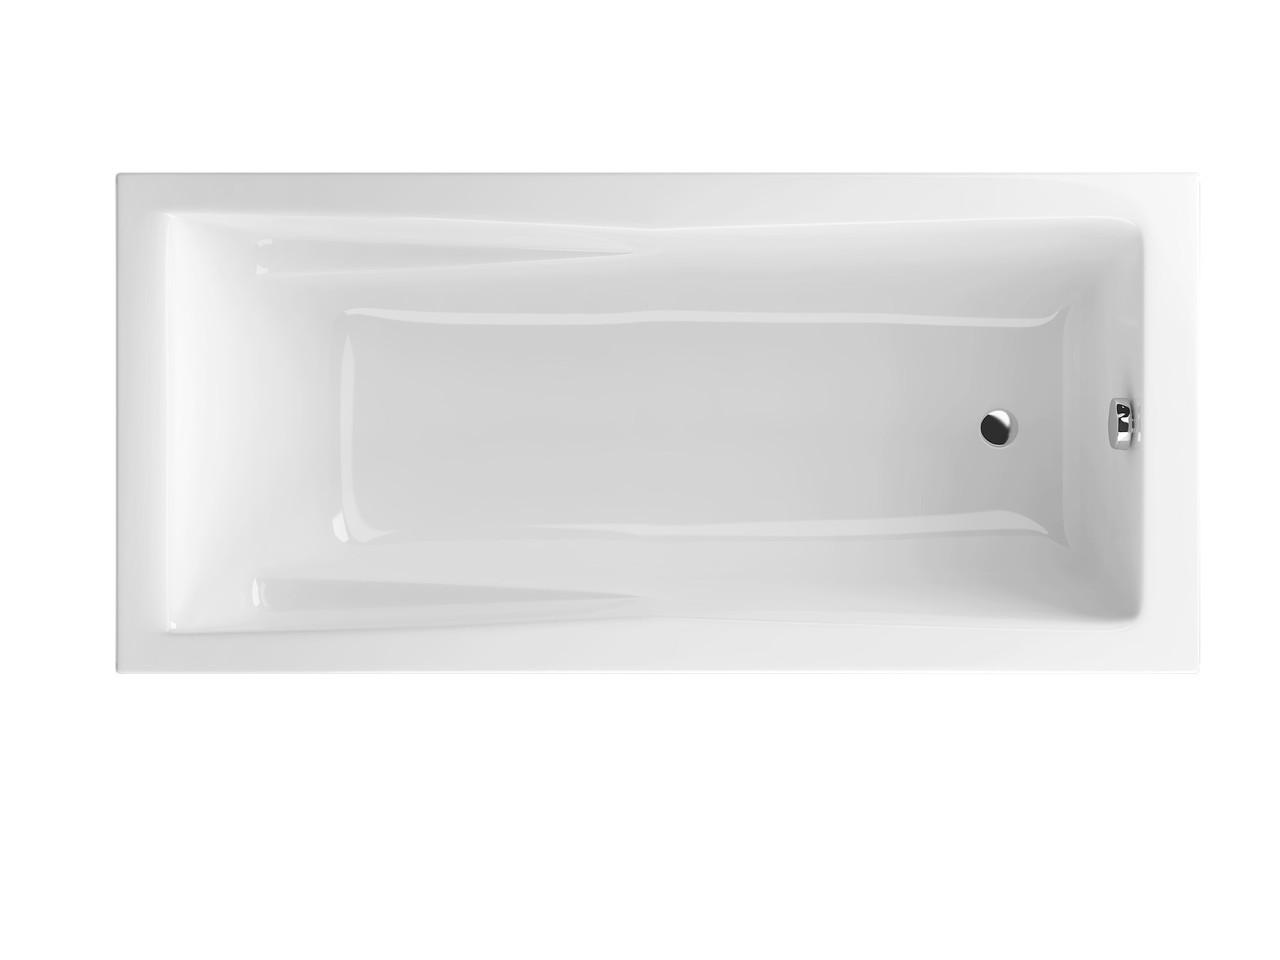 Ванна Excellent Palace 1800x800 мм (WAEX.PAL18WH)